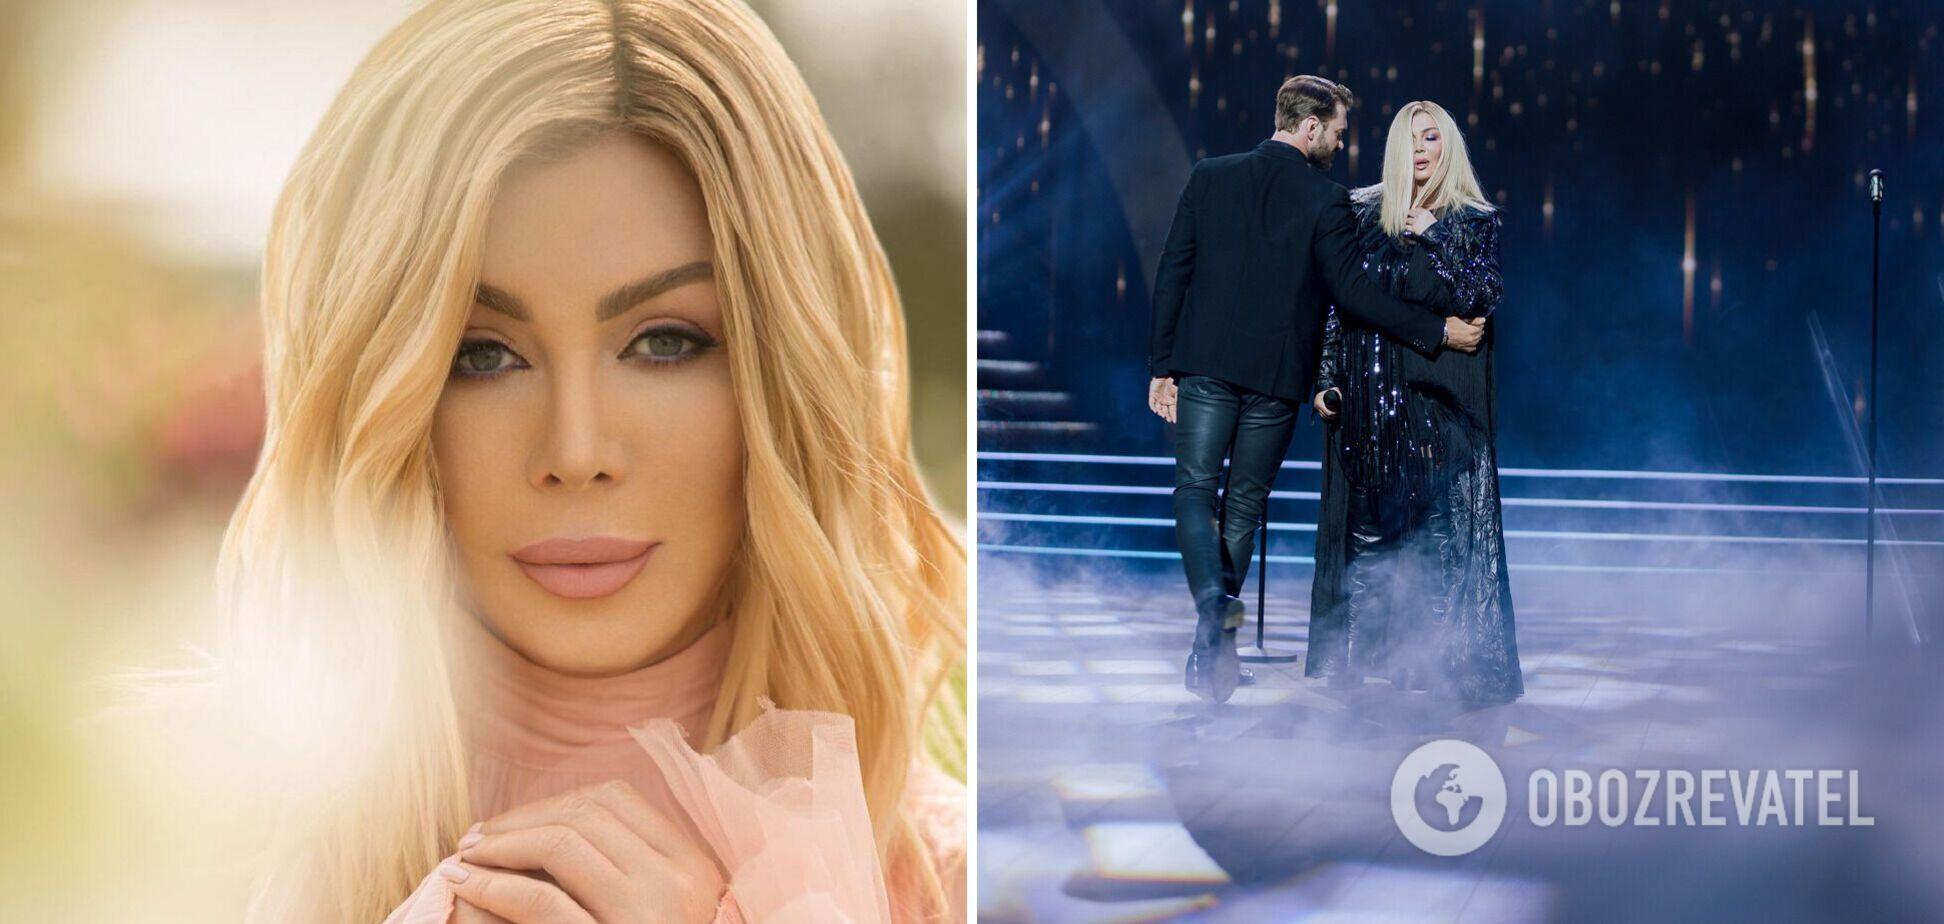 Ирина Билык на 'Танцях з зірками' спела с двумя бывшими мужьями песню о любви. Видео